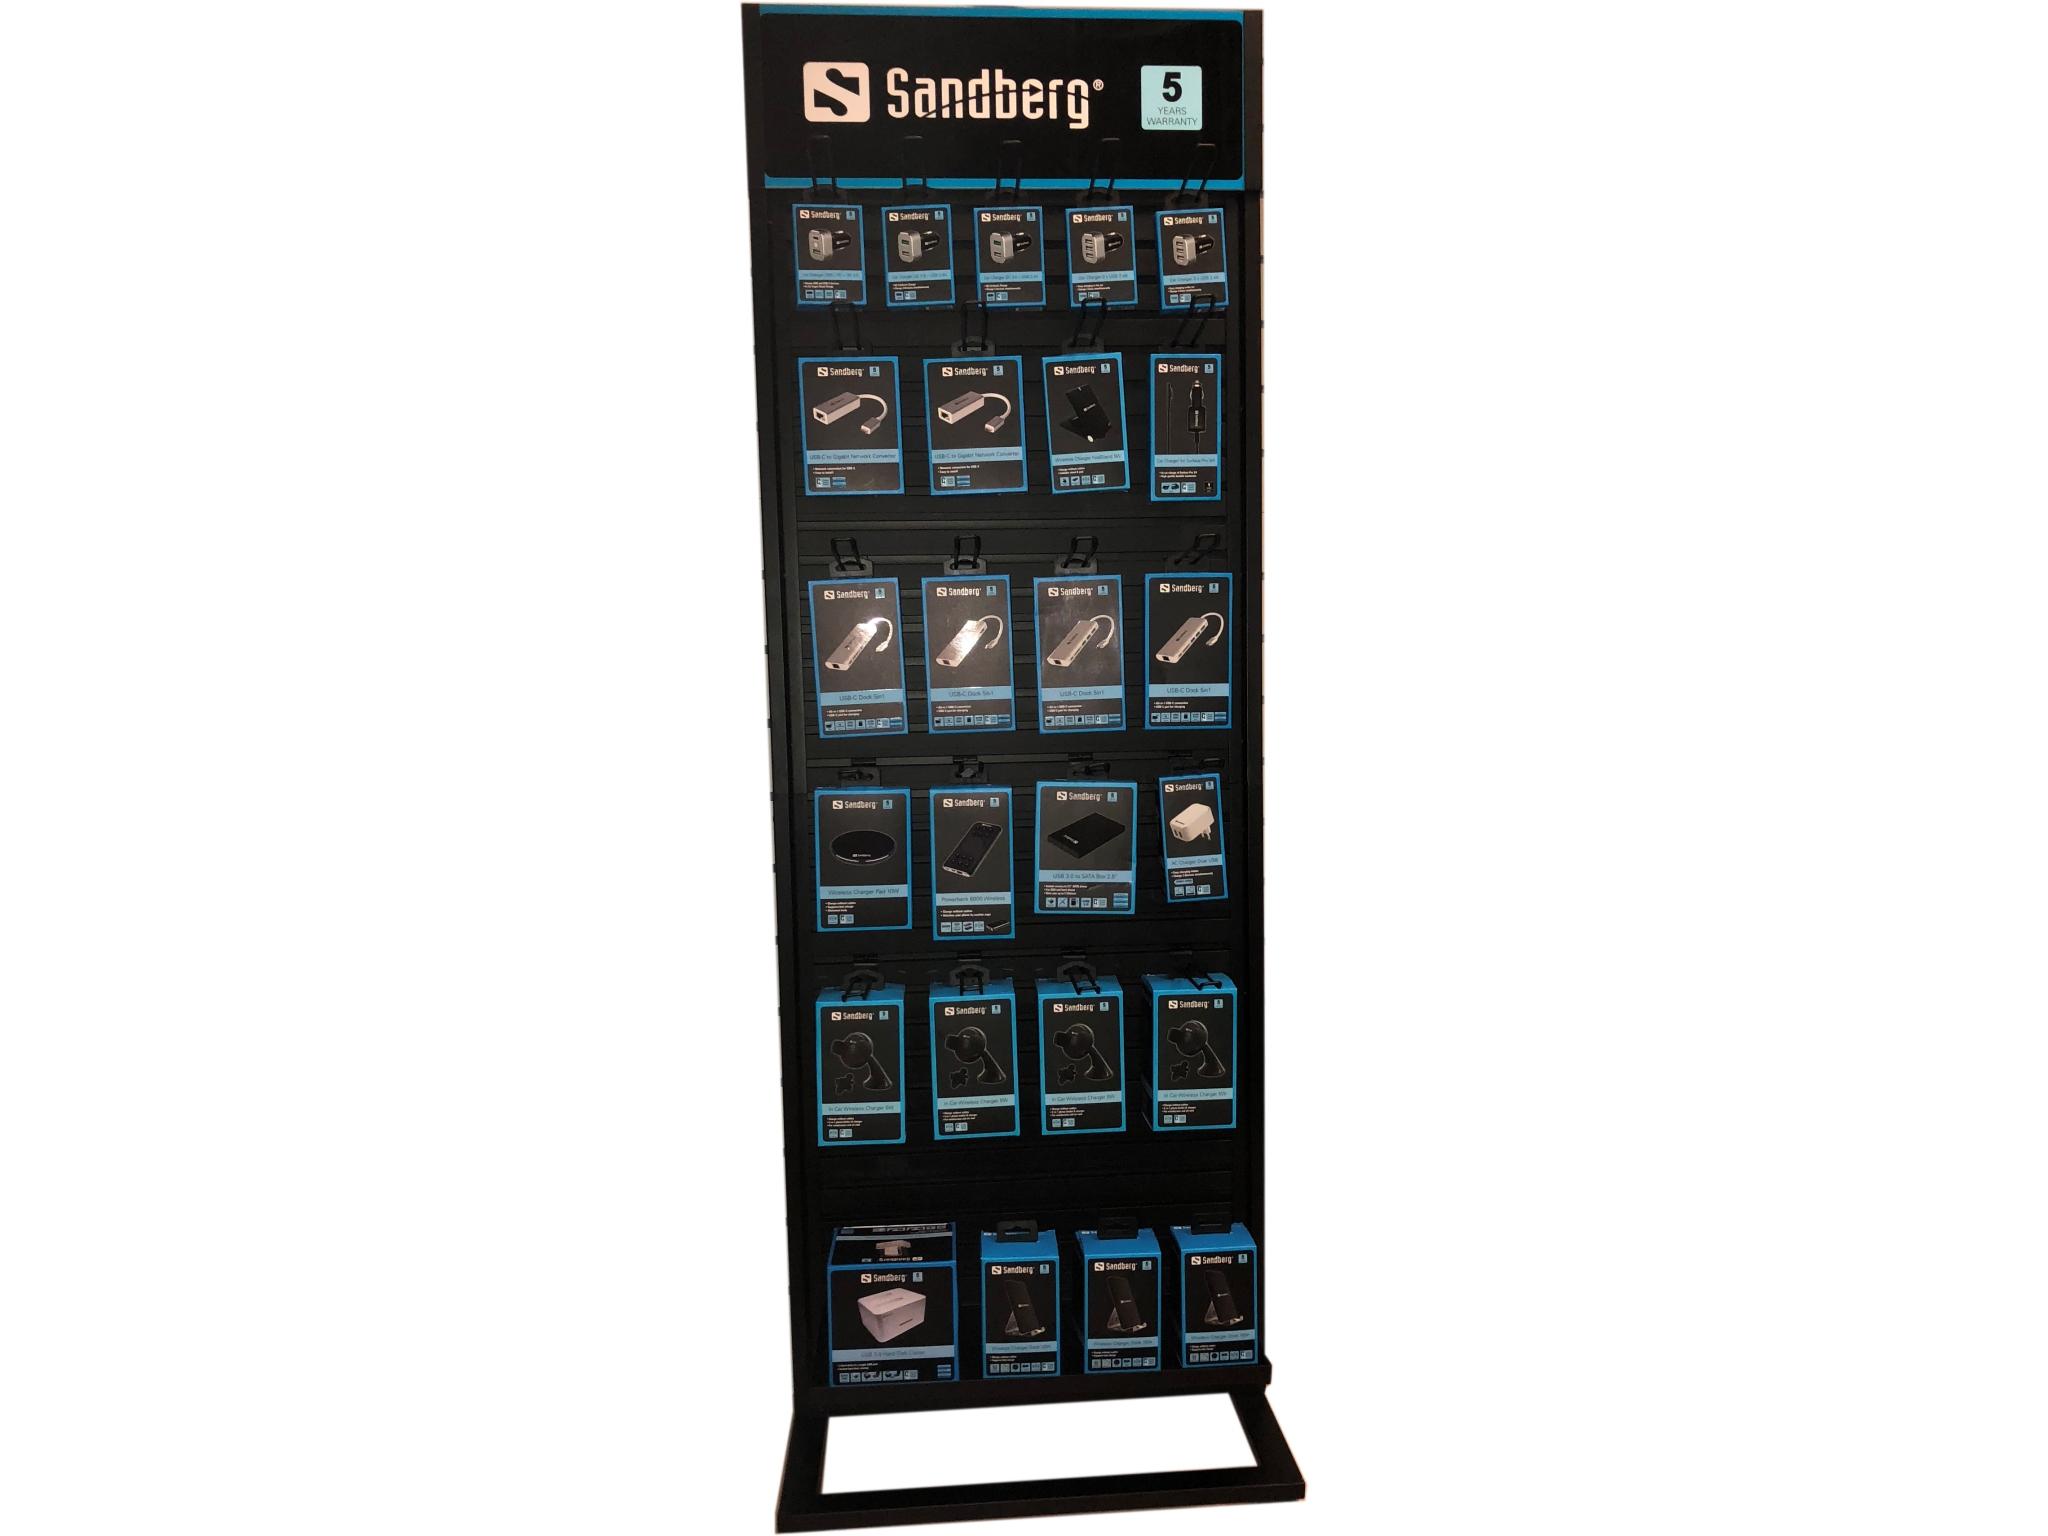 Sandberg Alu Slatwall Display 2 Sided 999 50 Kopen Online